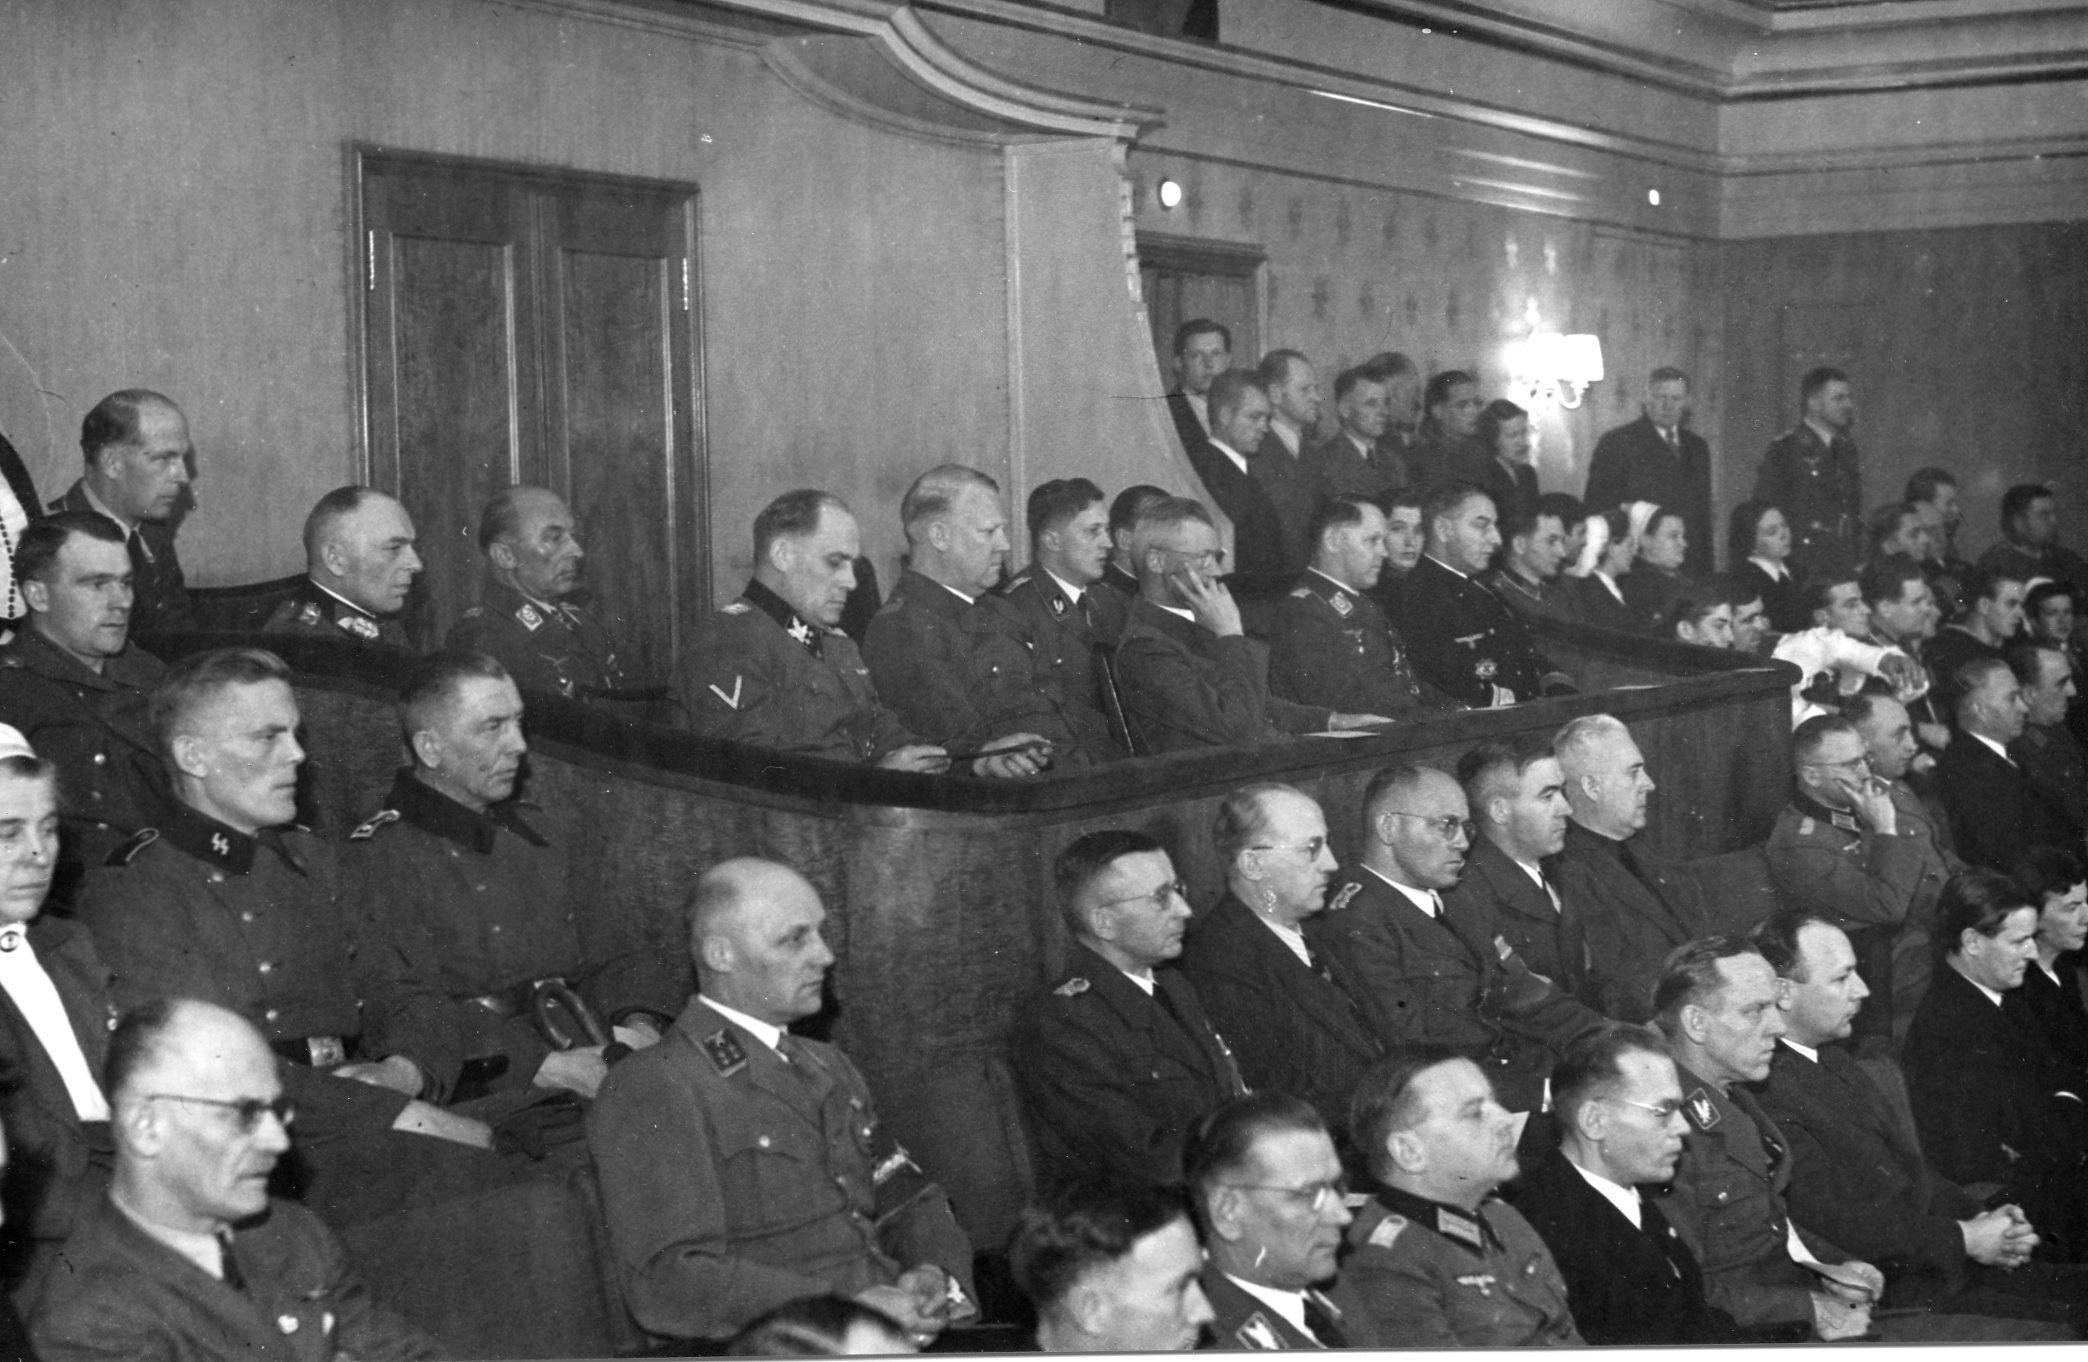 Reichskommissariat Heldengedenktag